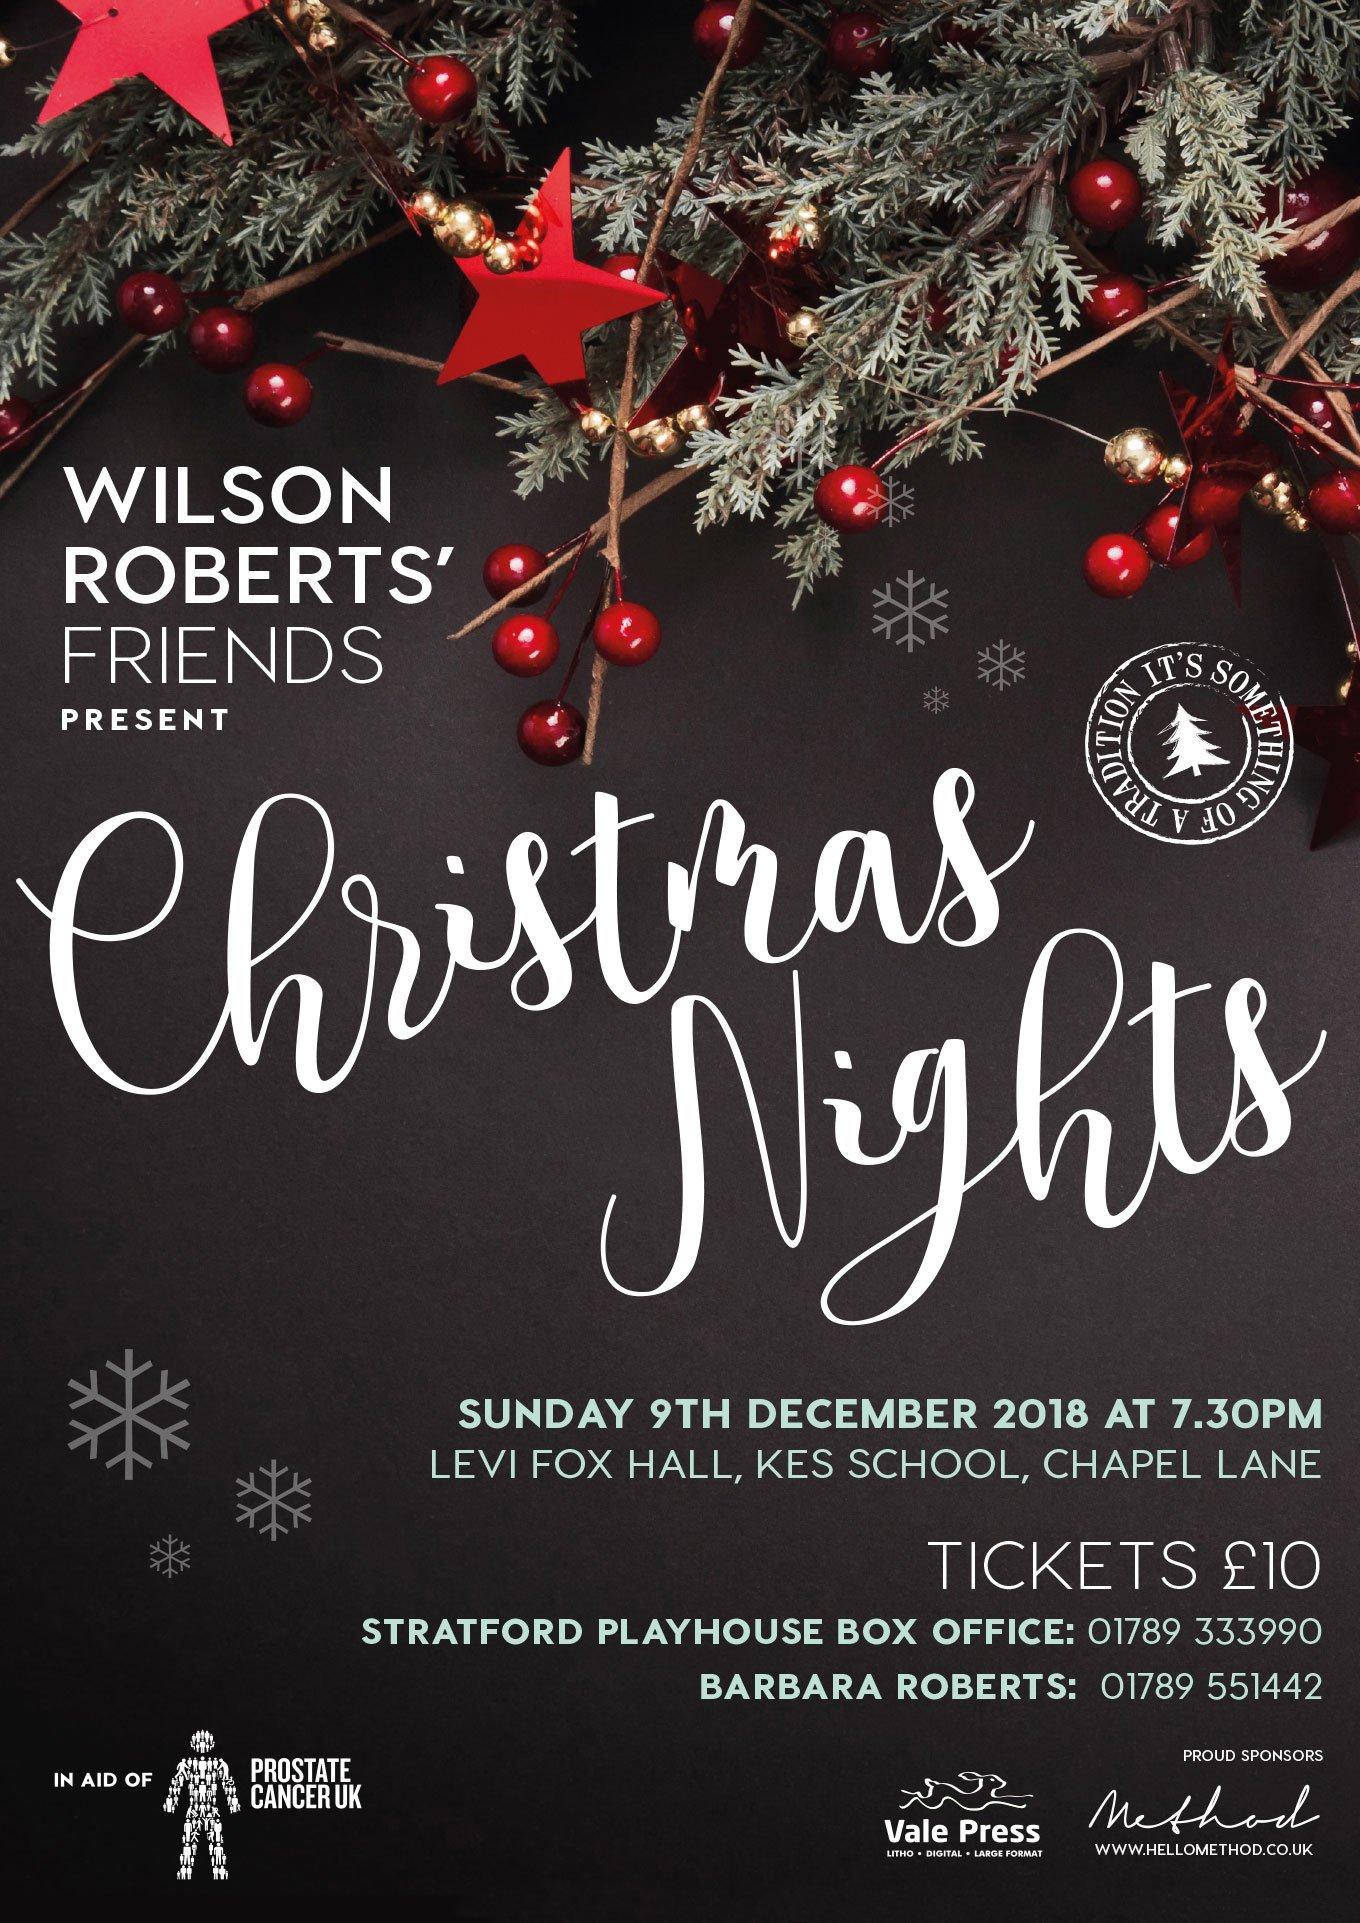 Wilson Roberts' Friends Present Christmas Nights